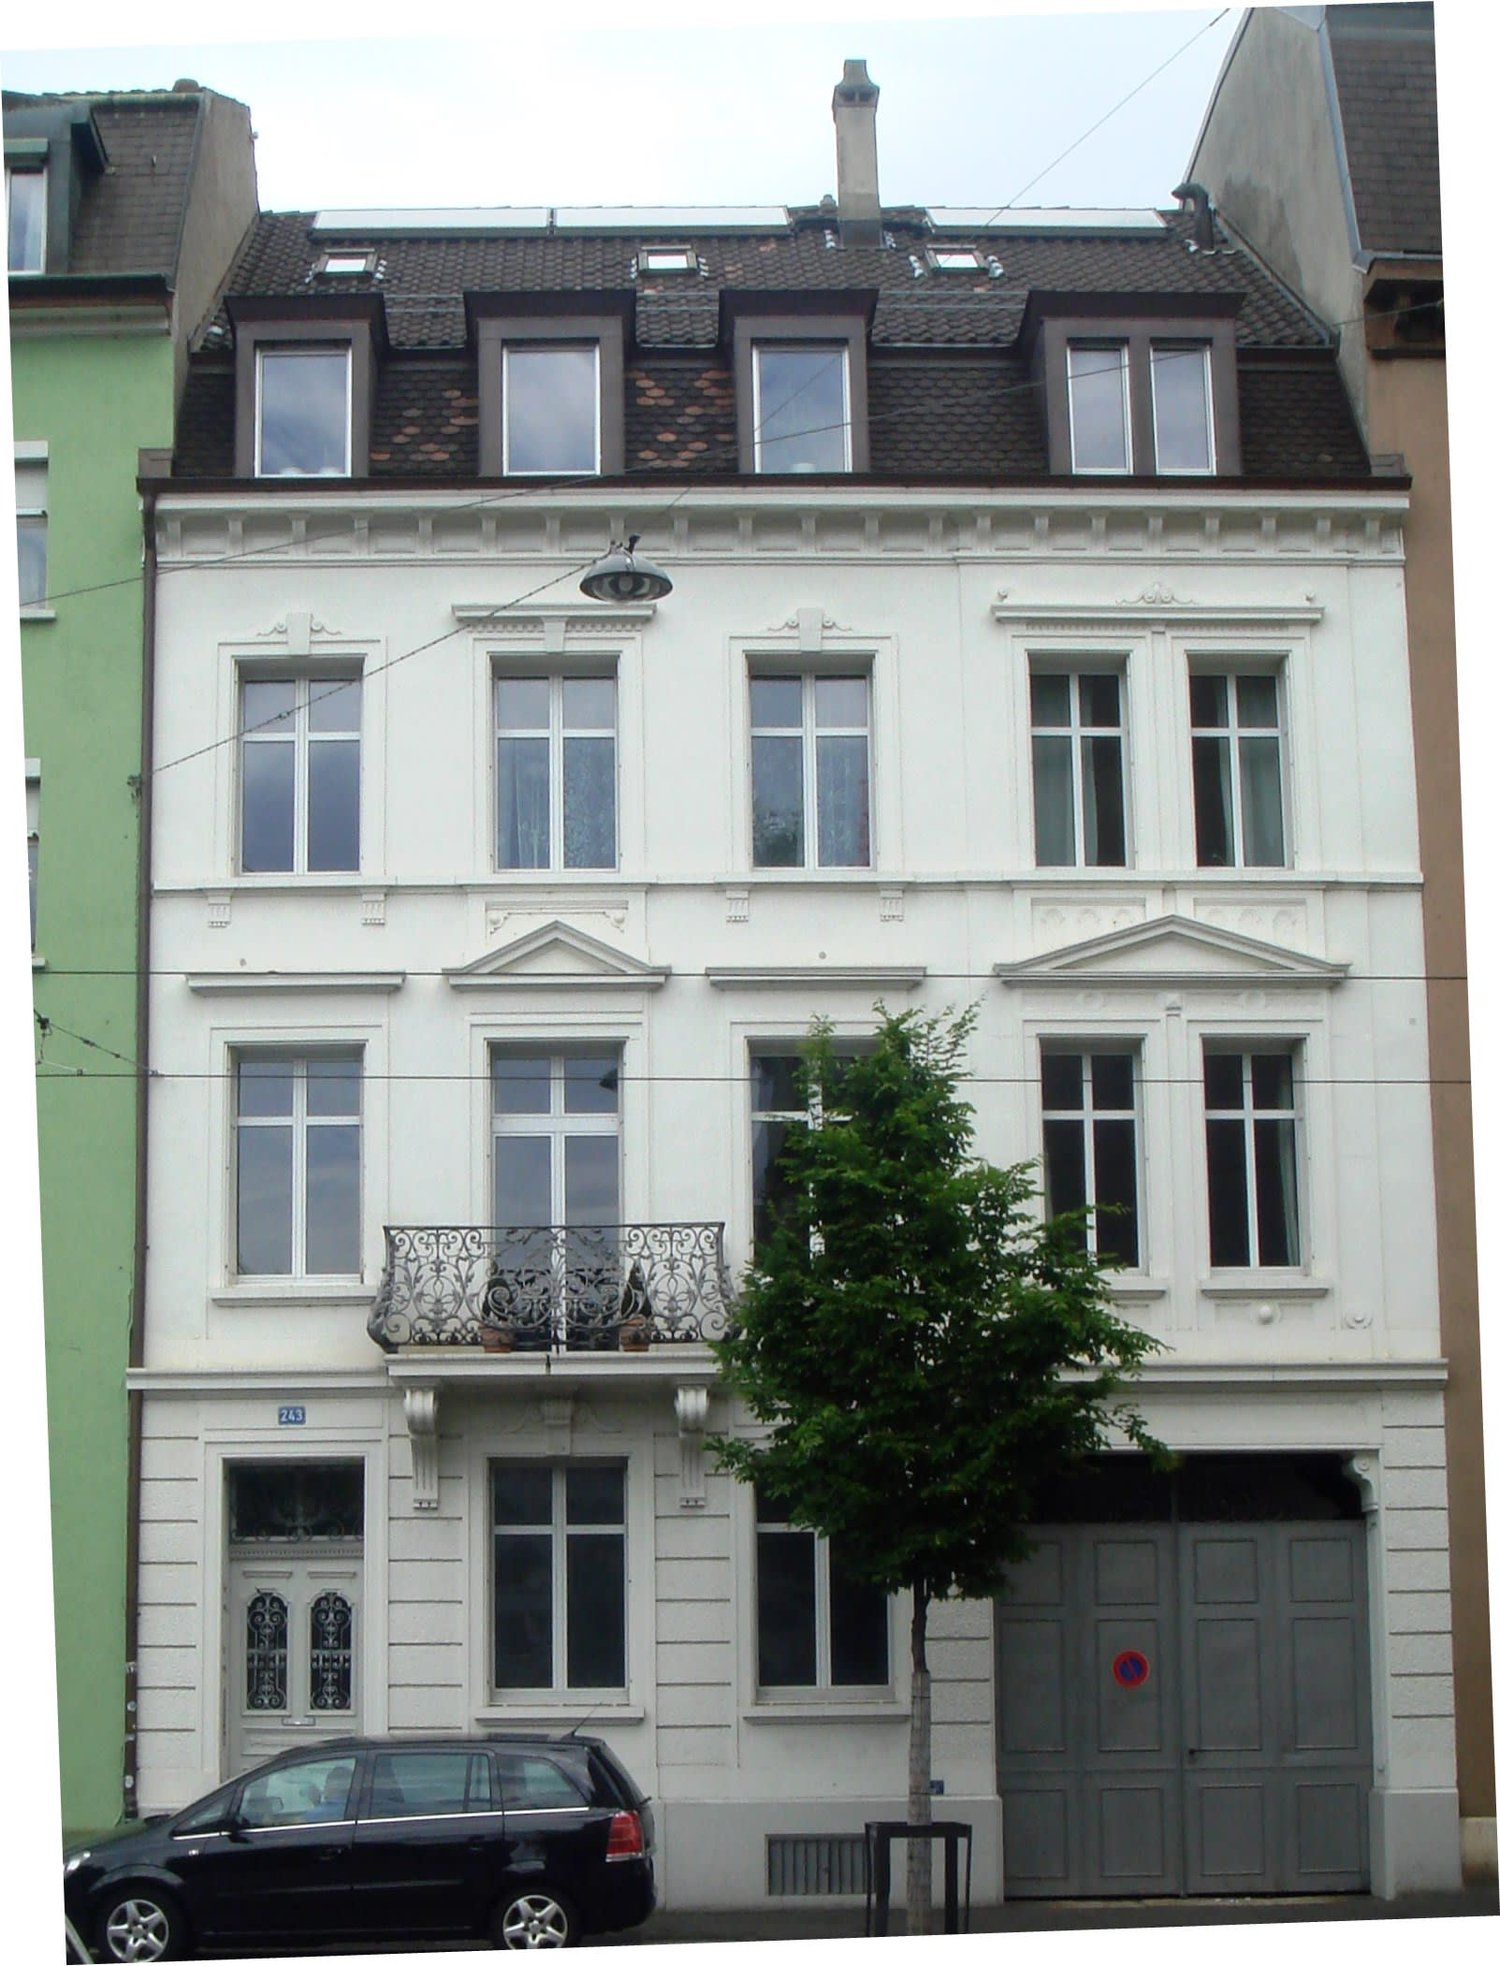 Güterstrasse, 243